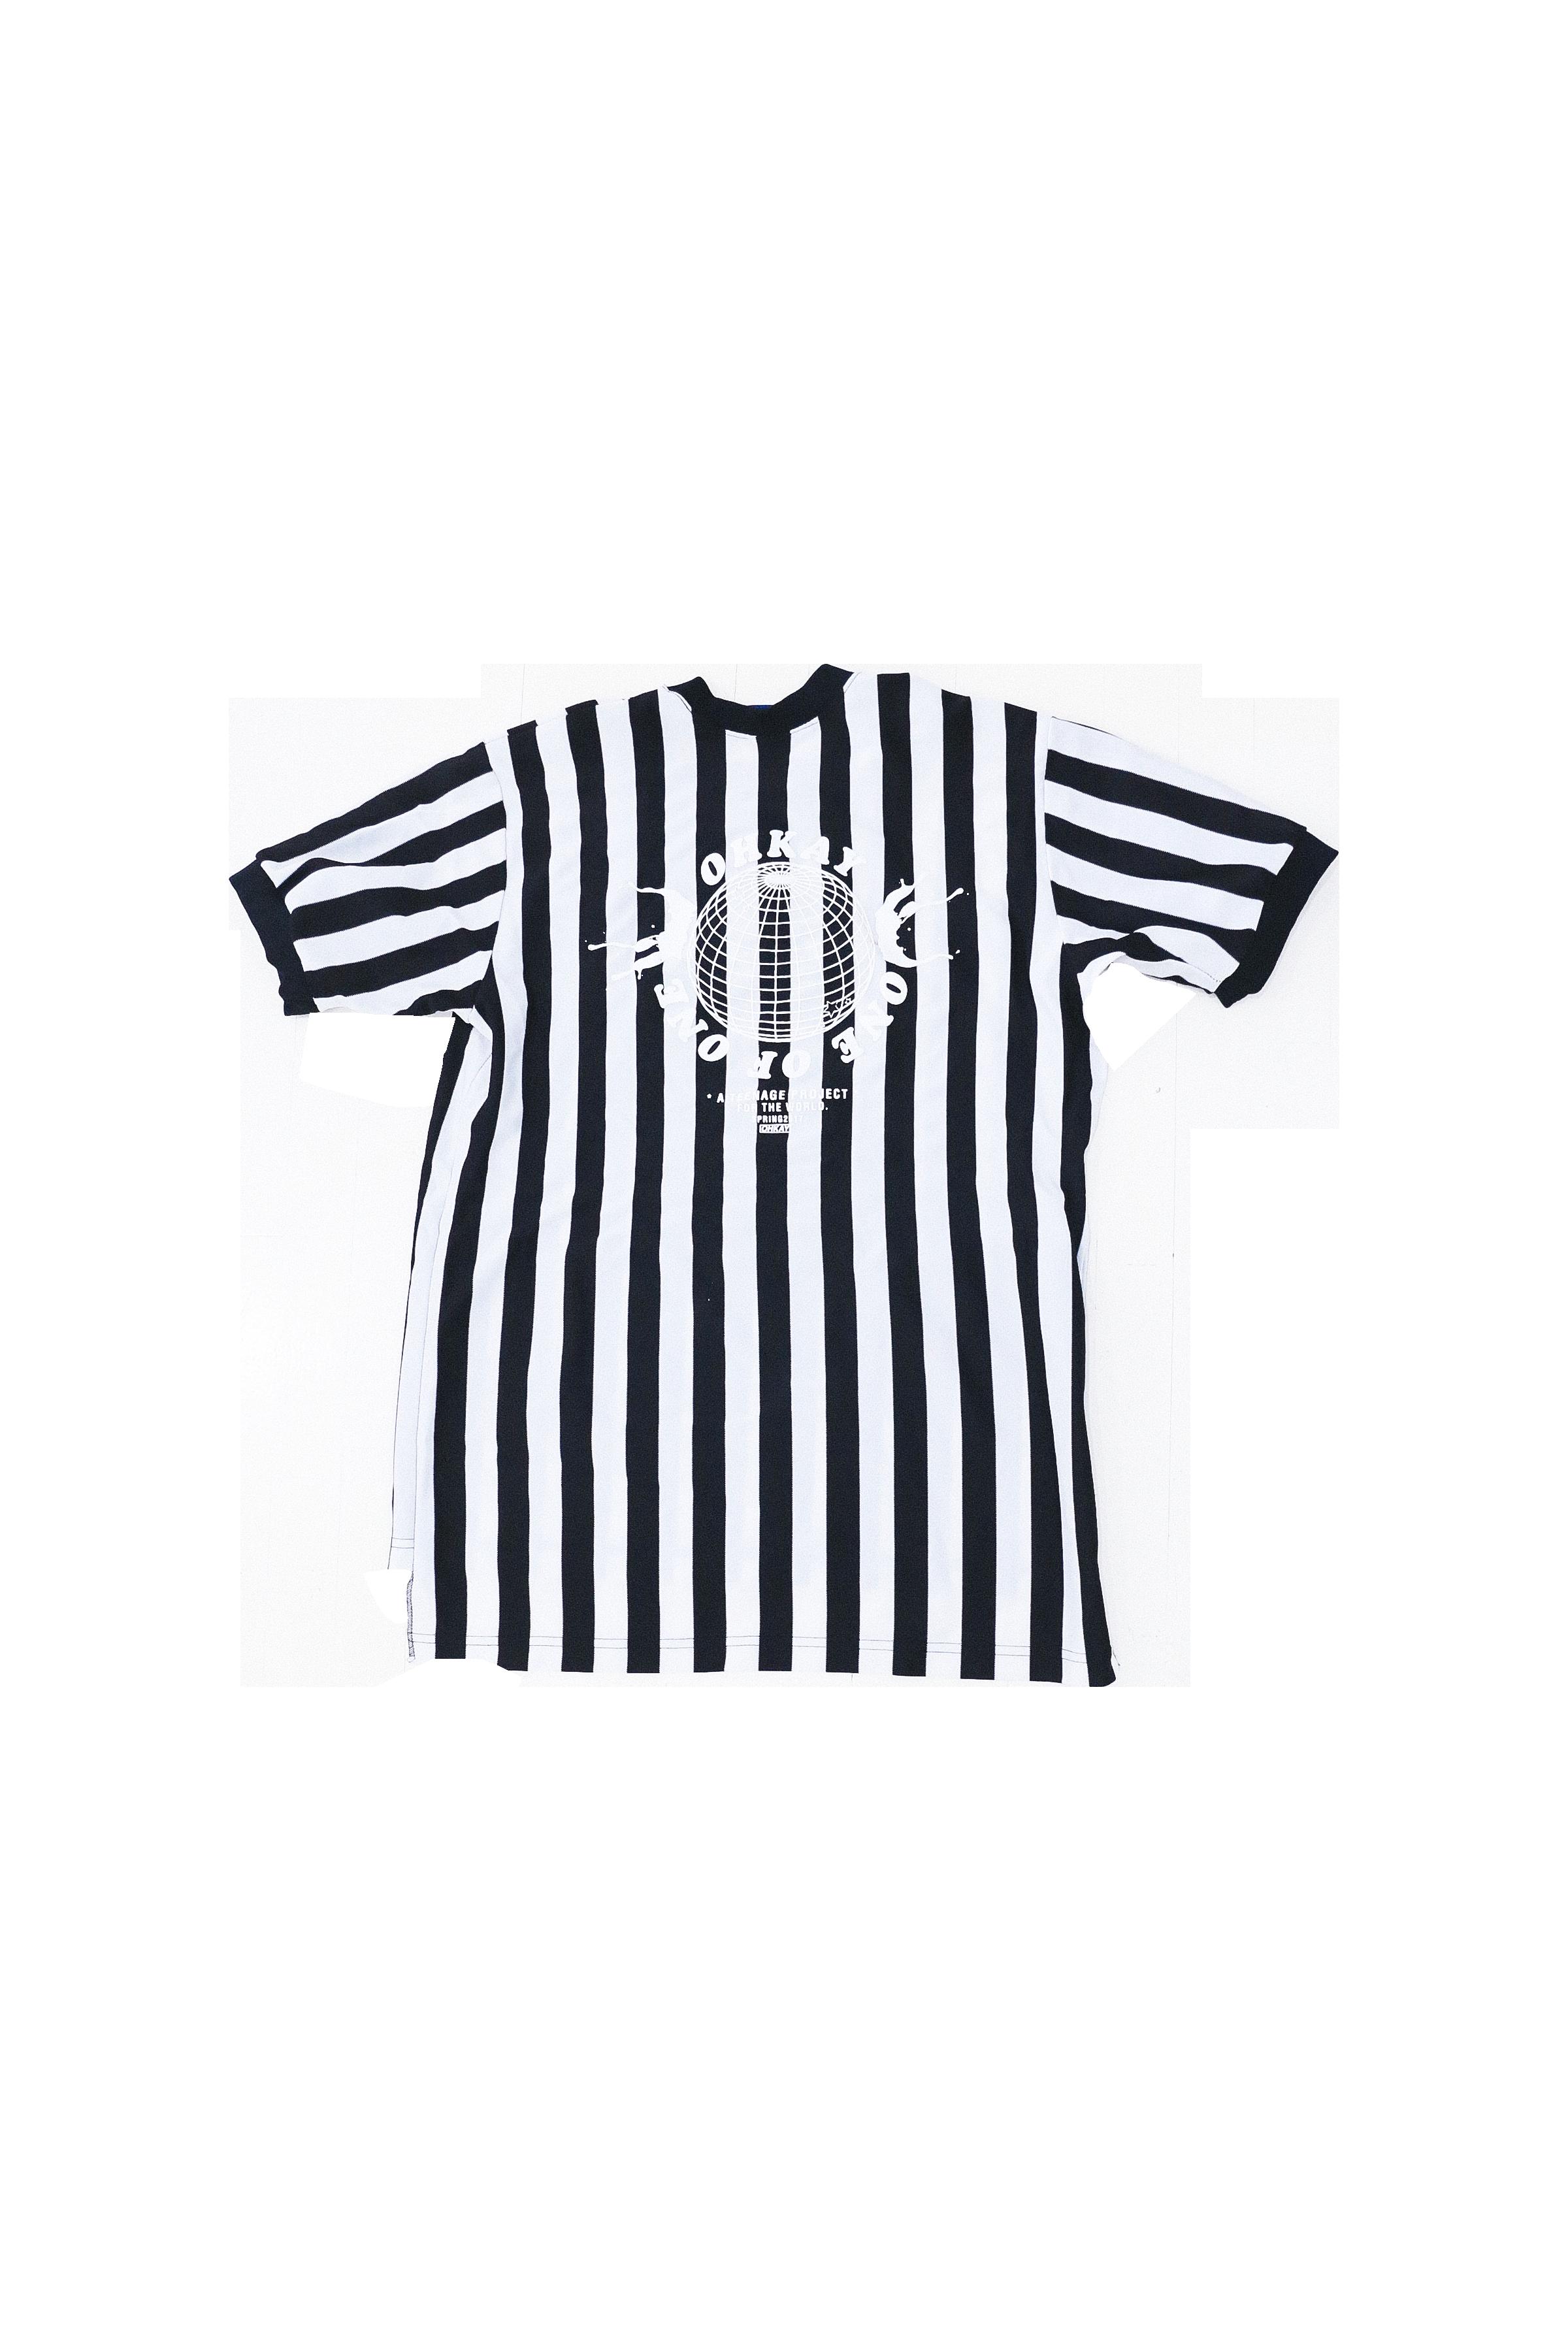 soccer striped back.png